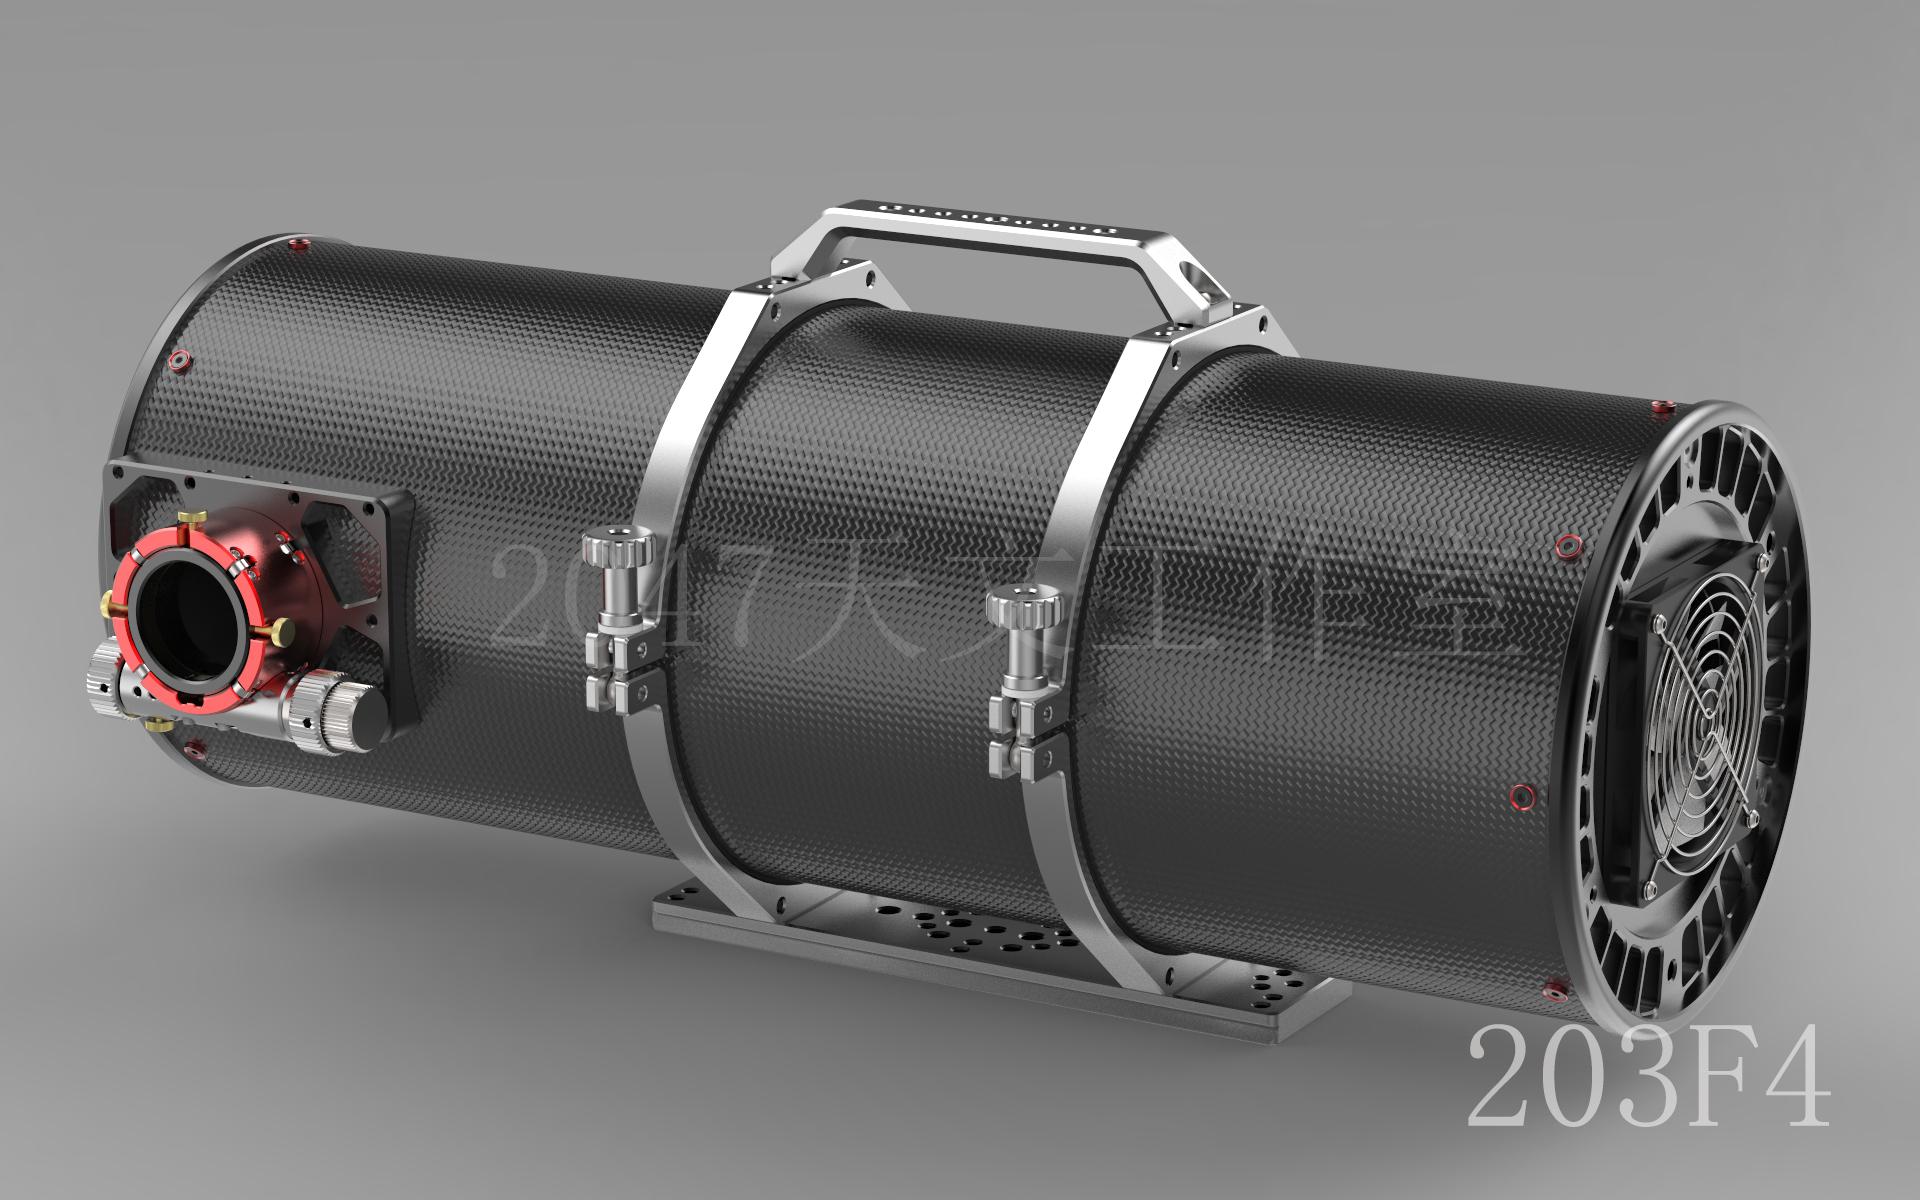 20200221-203碳筒牛反-02.png